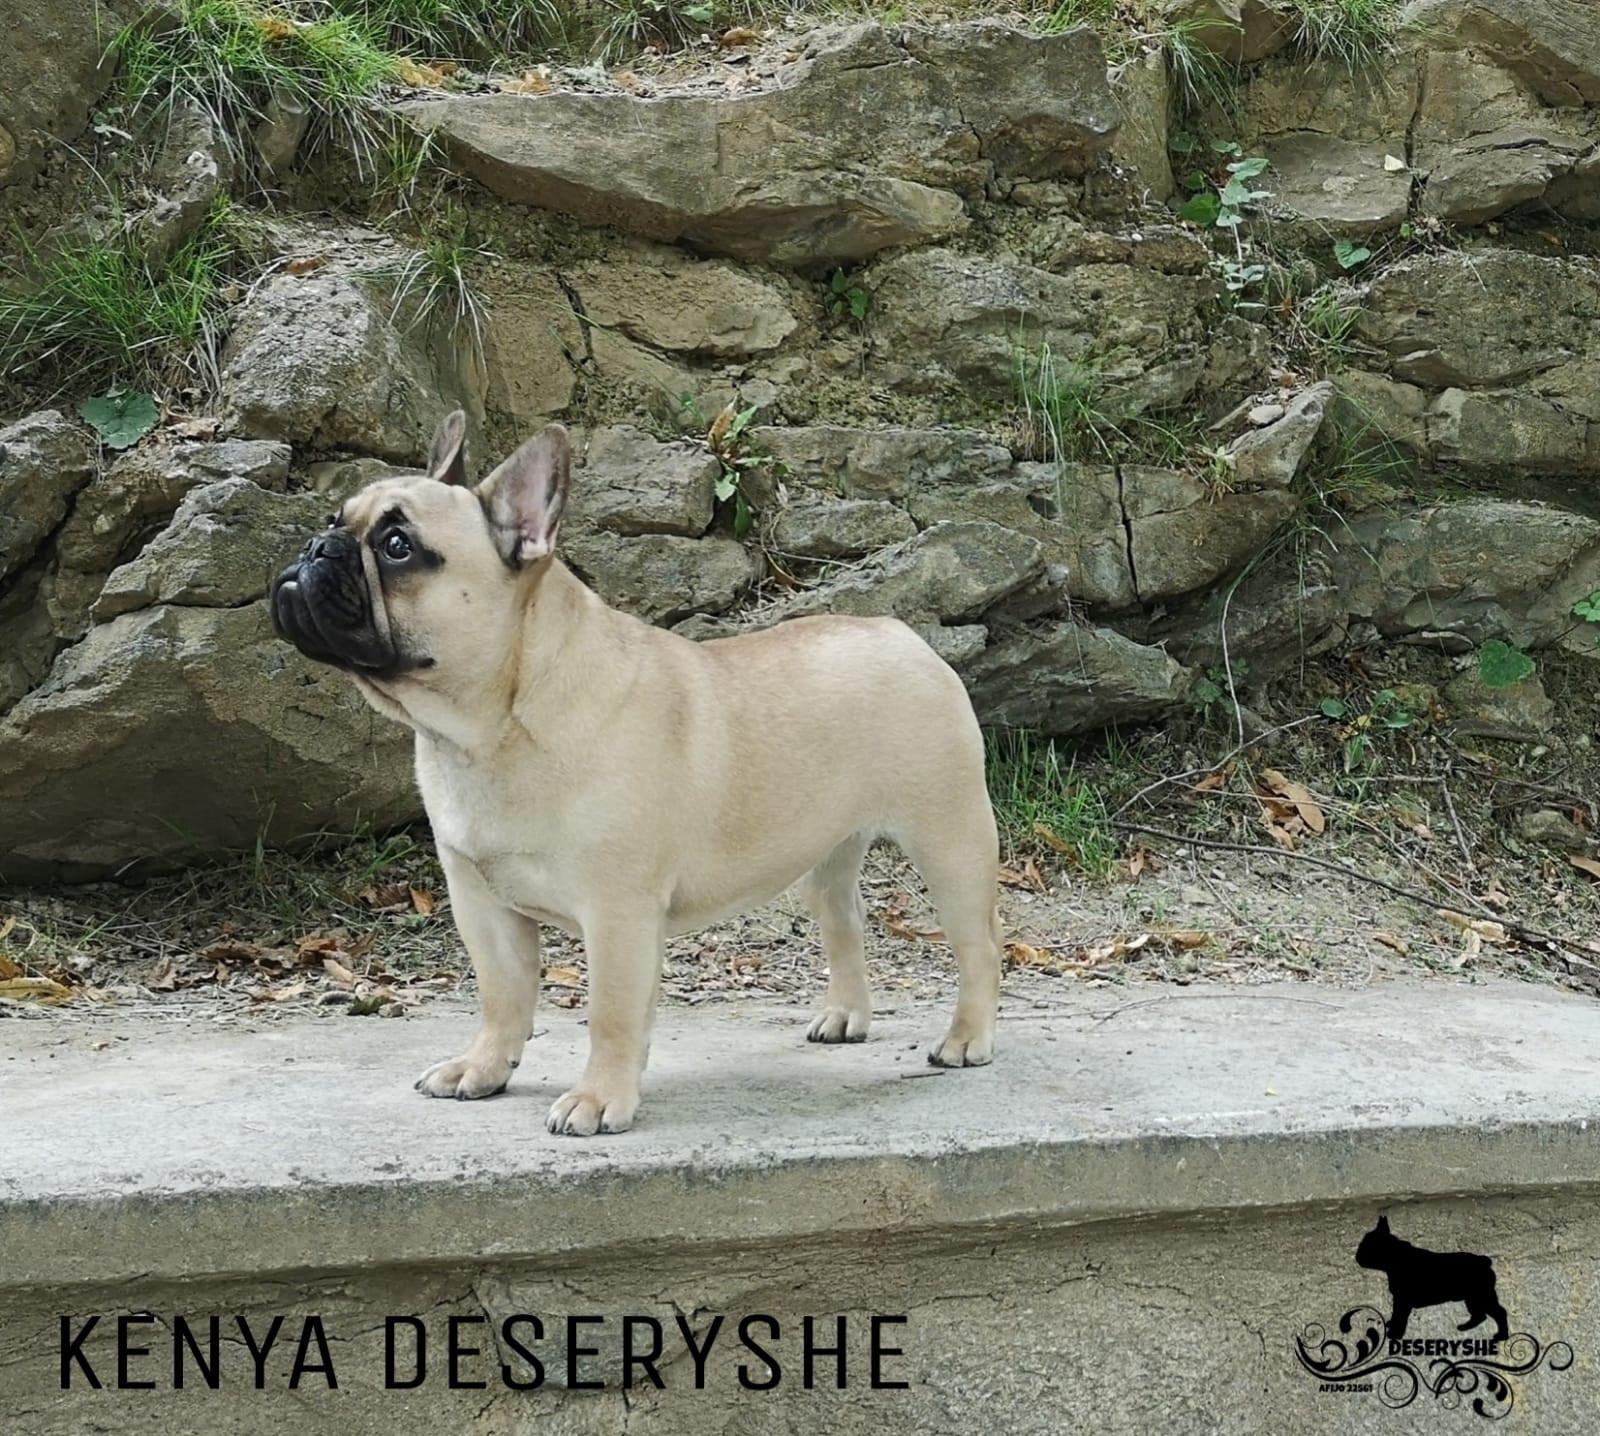 KENYA DESERYSHE- 10 MESES